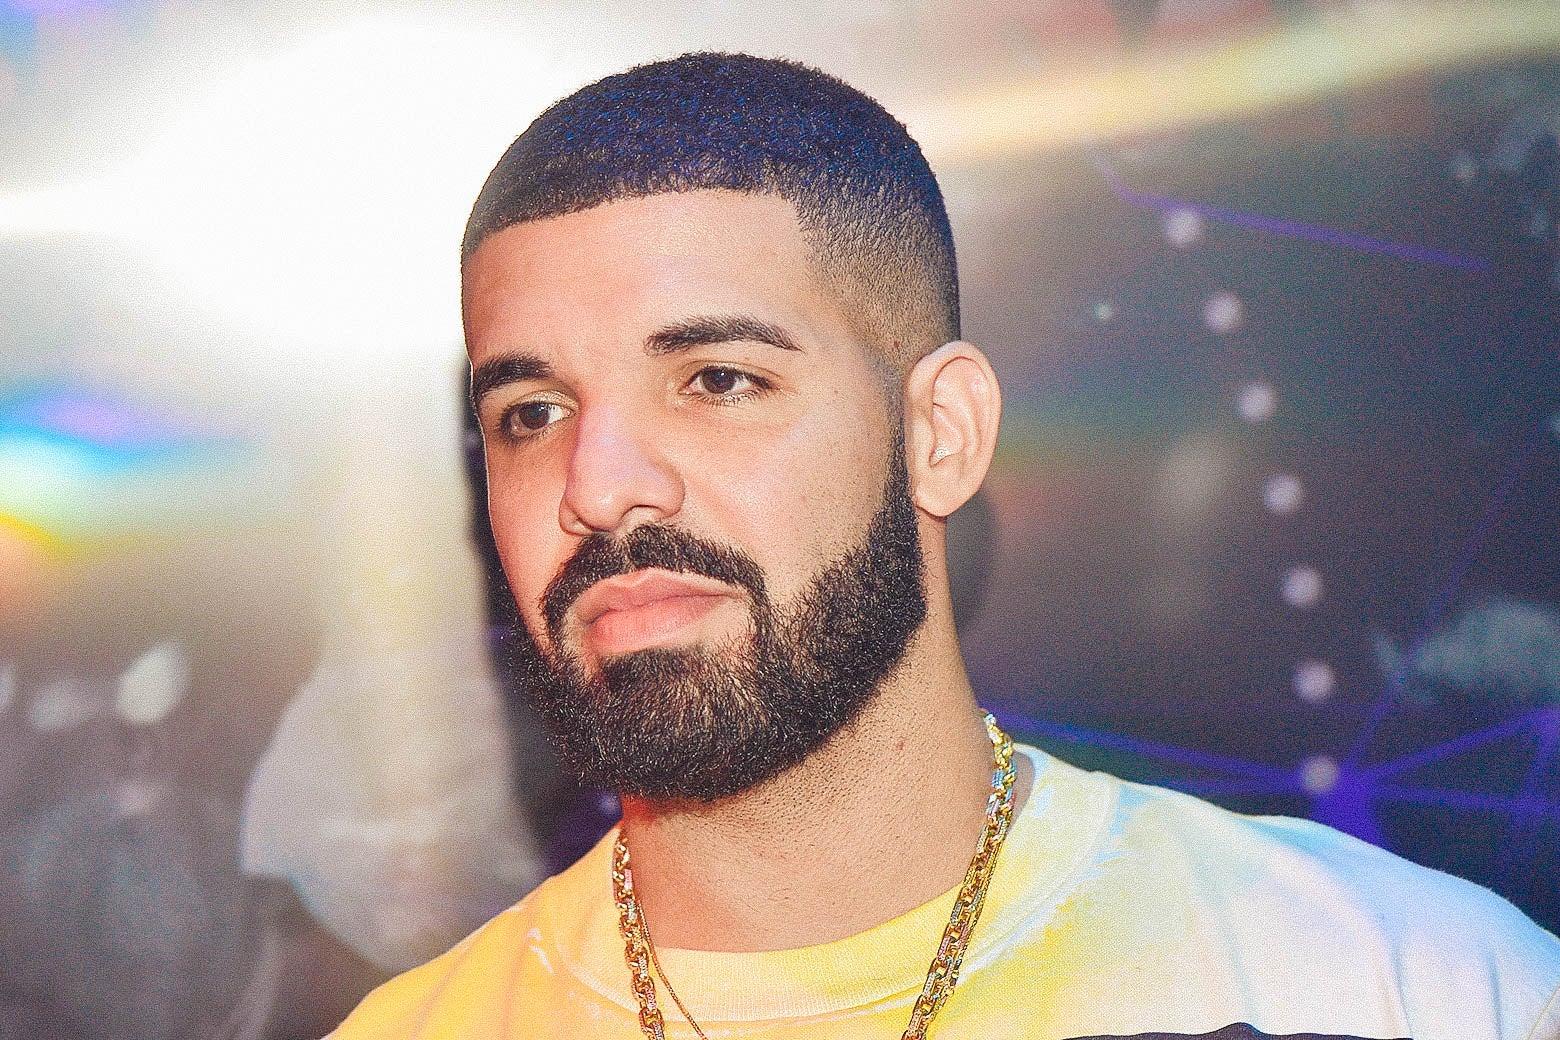 Drake in Atlanta, Georgia on May 7, 2018.